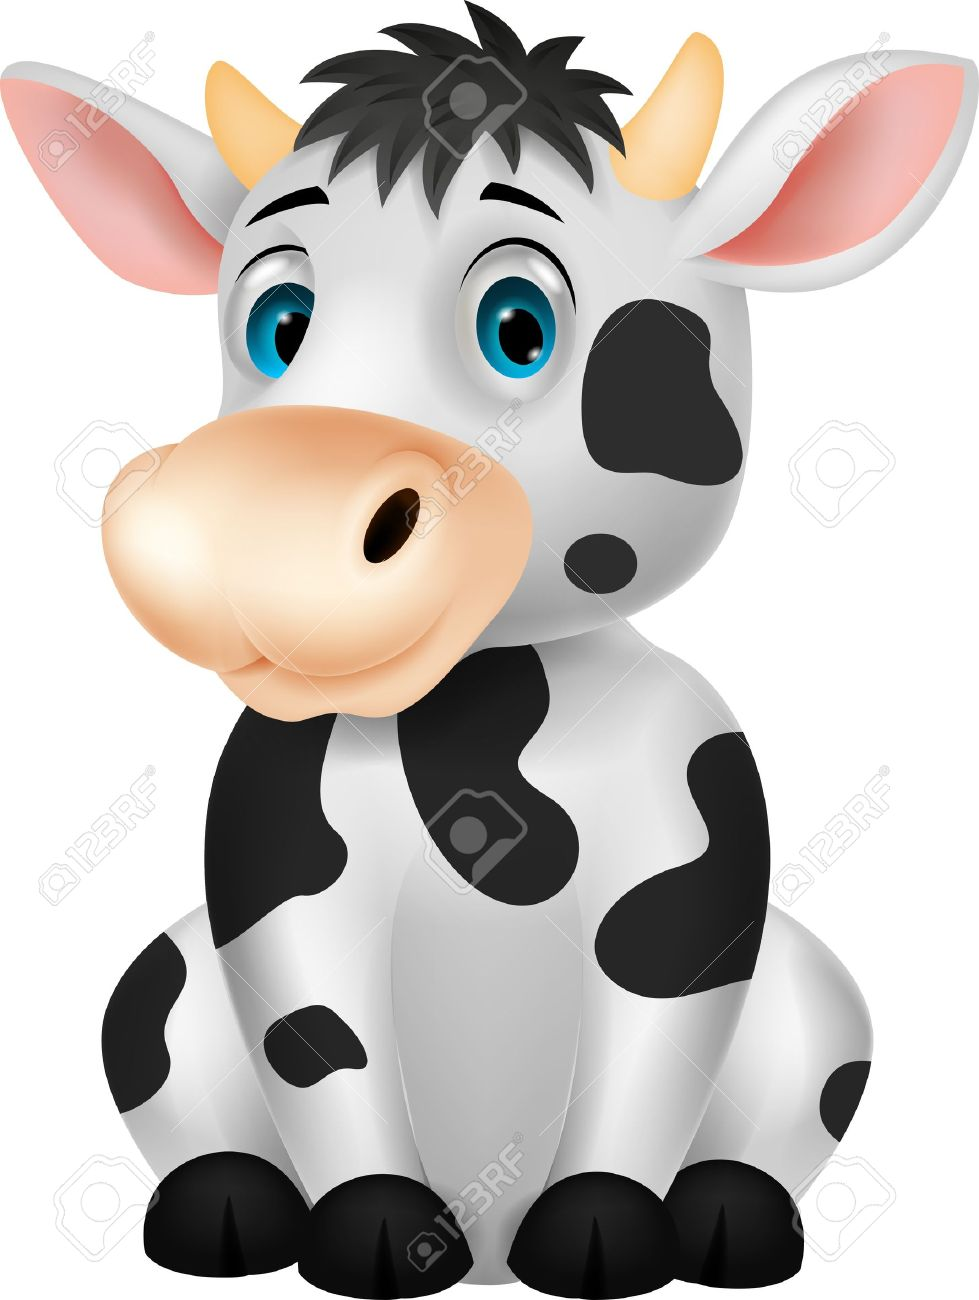 Cute cartoon baby cows